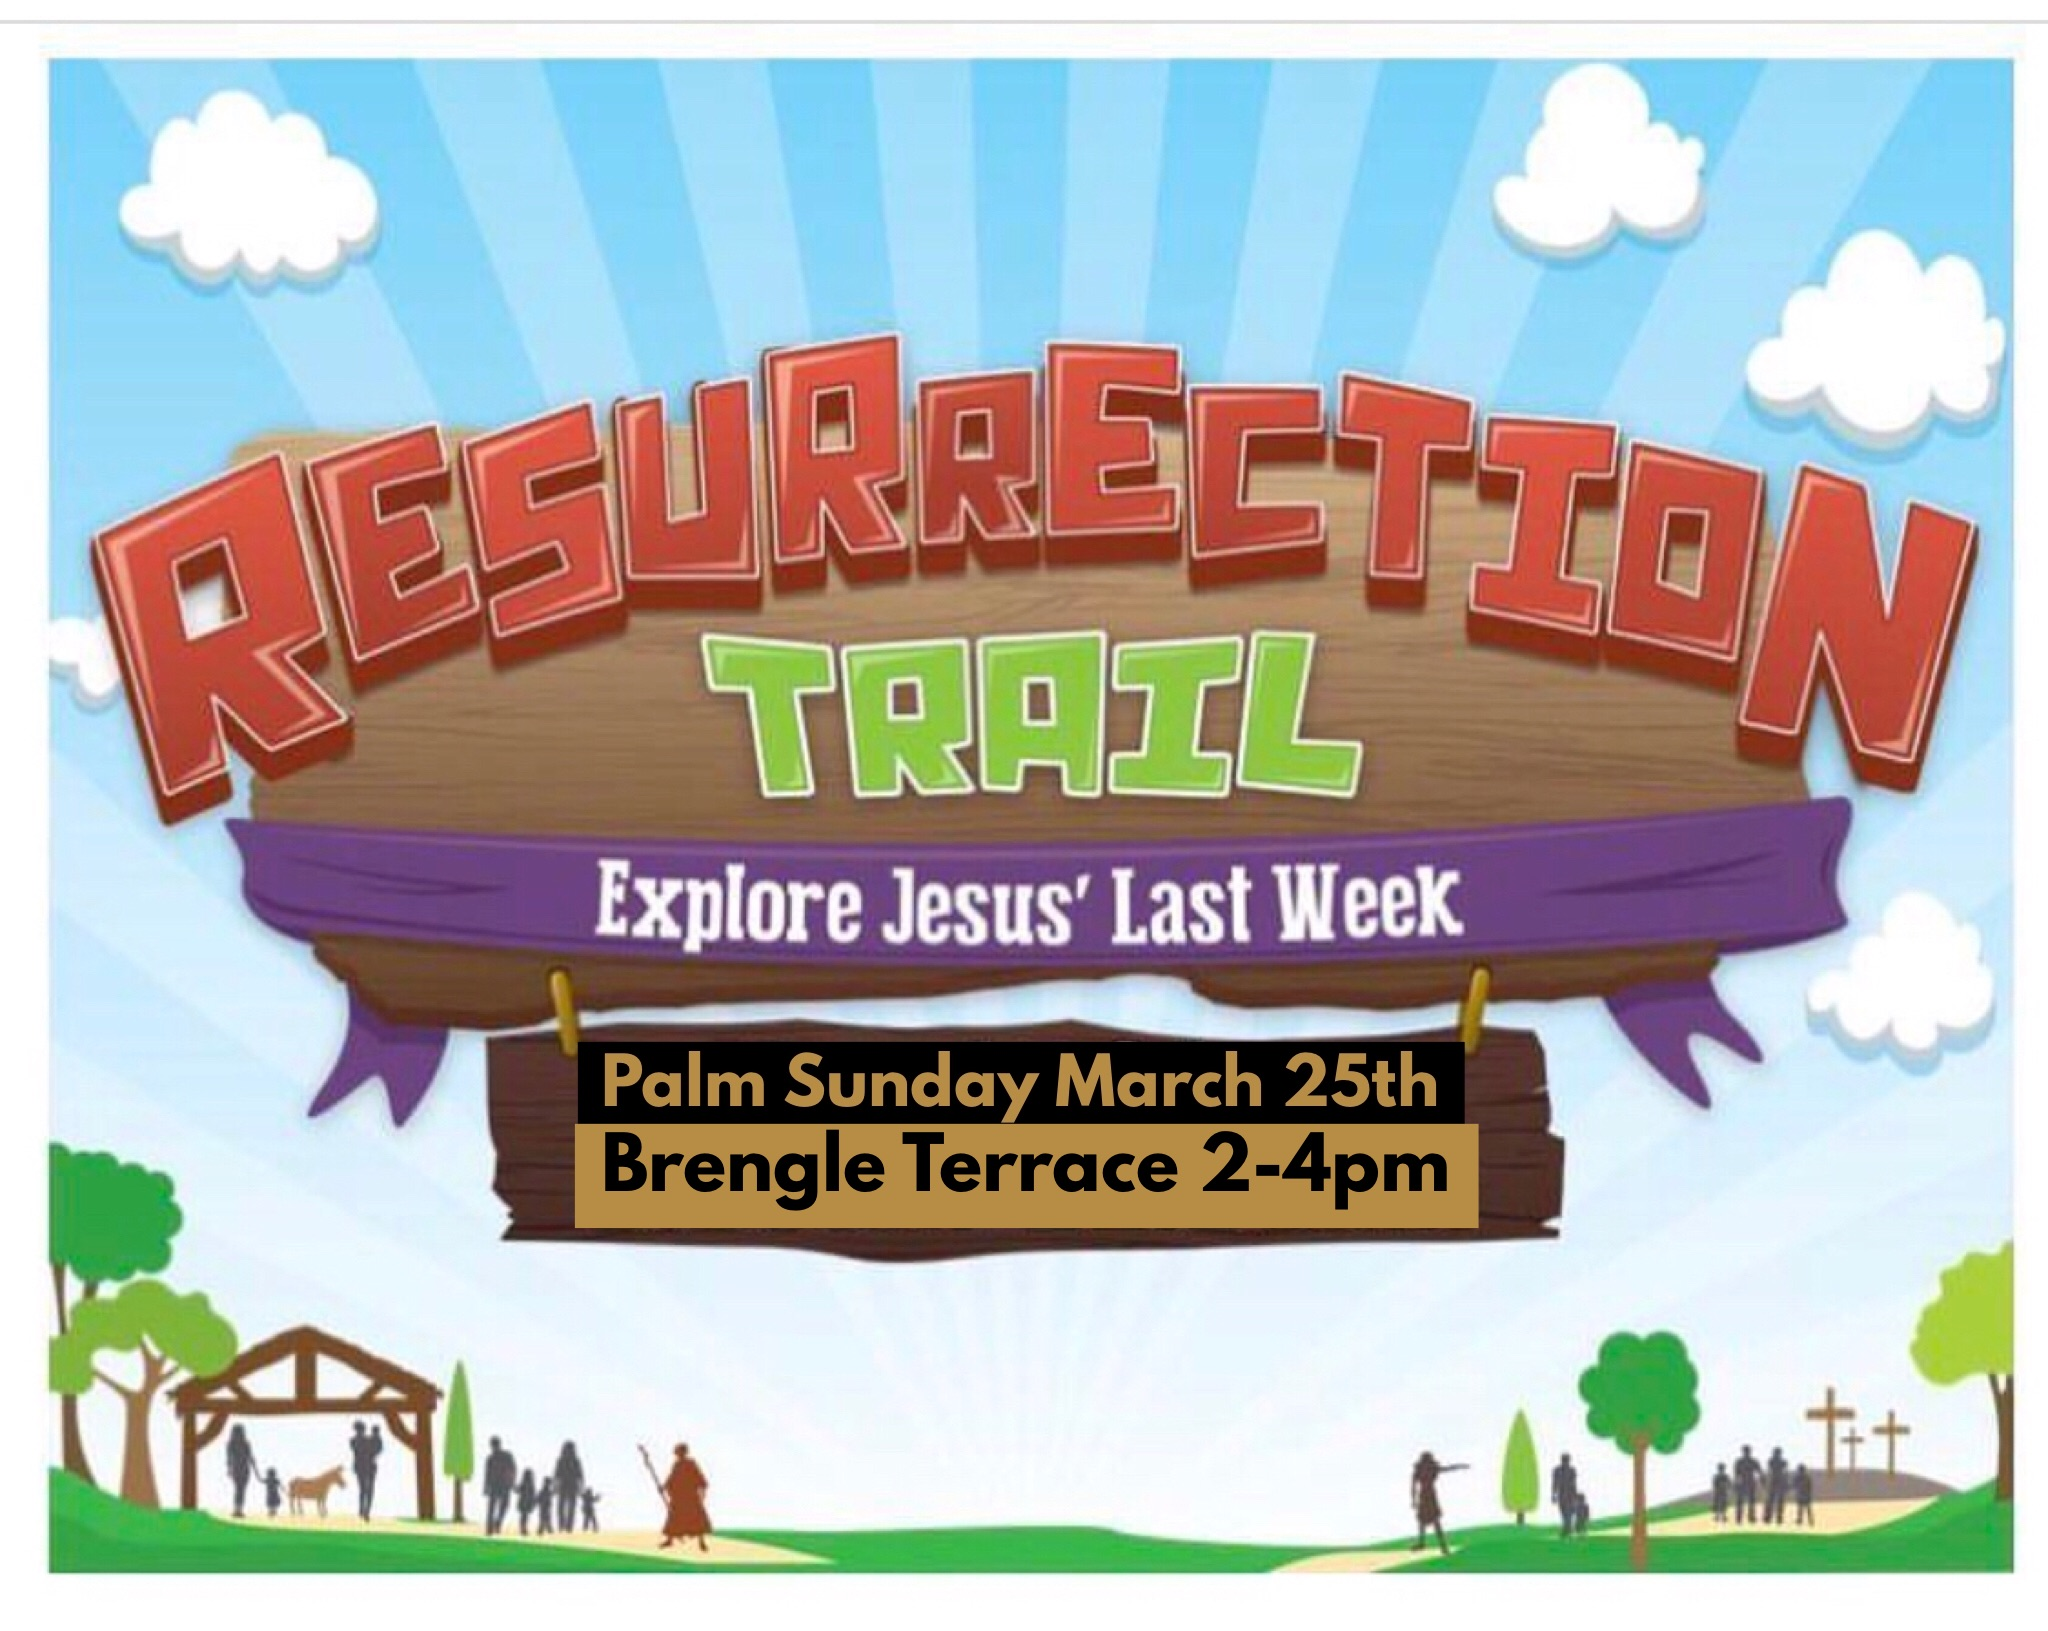 Resurrection trail logo